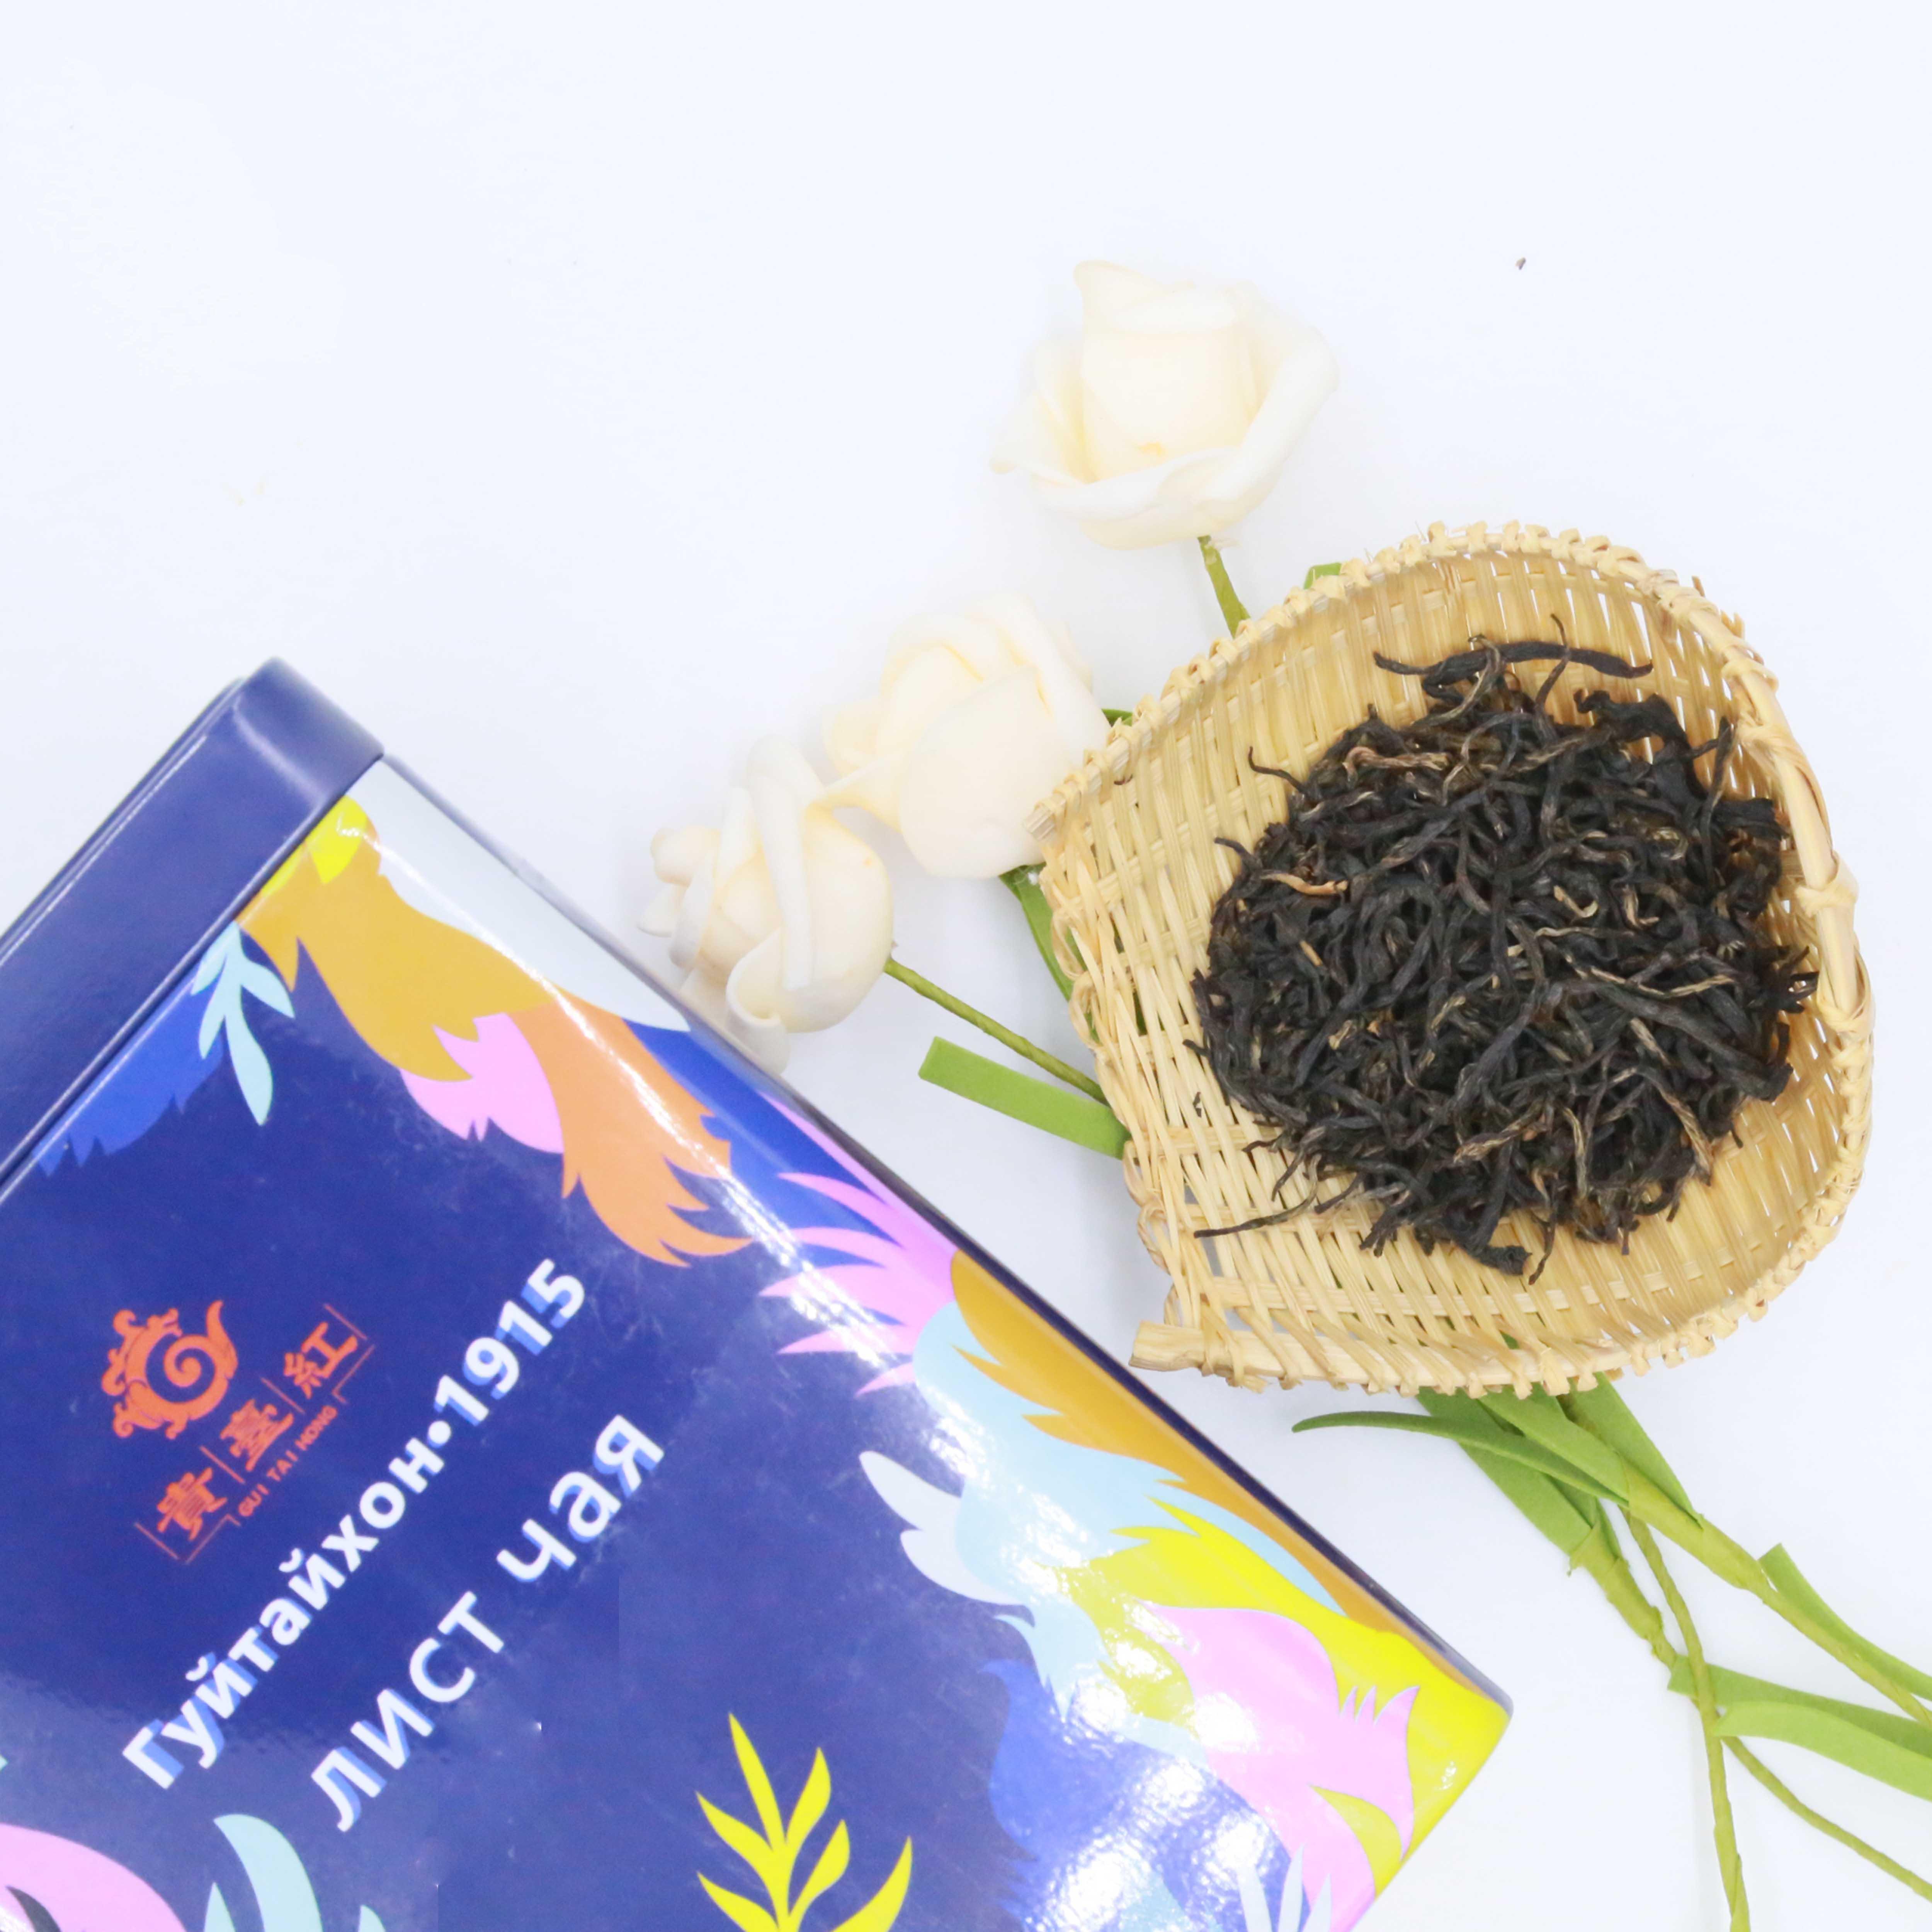 Factory Supply Competitive Price black tea - 4uTea | 4uTea.com